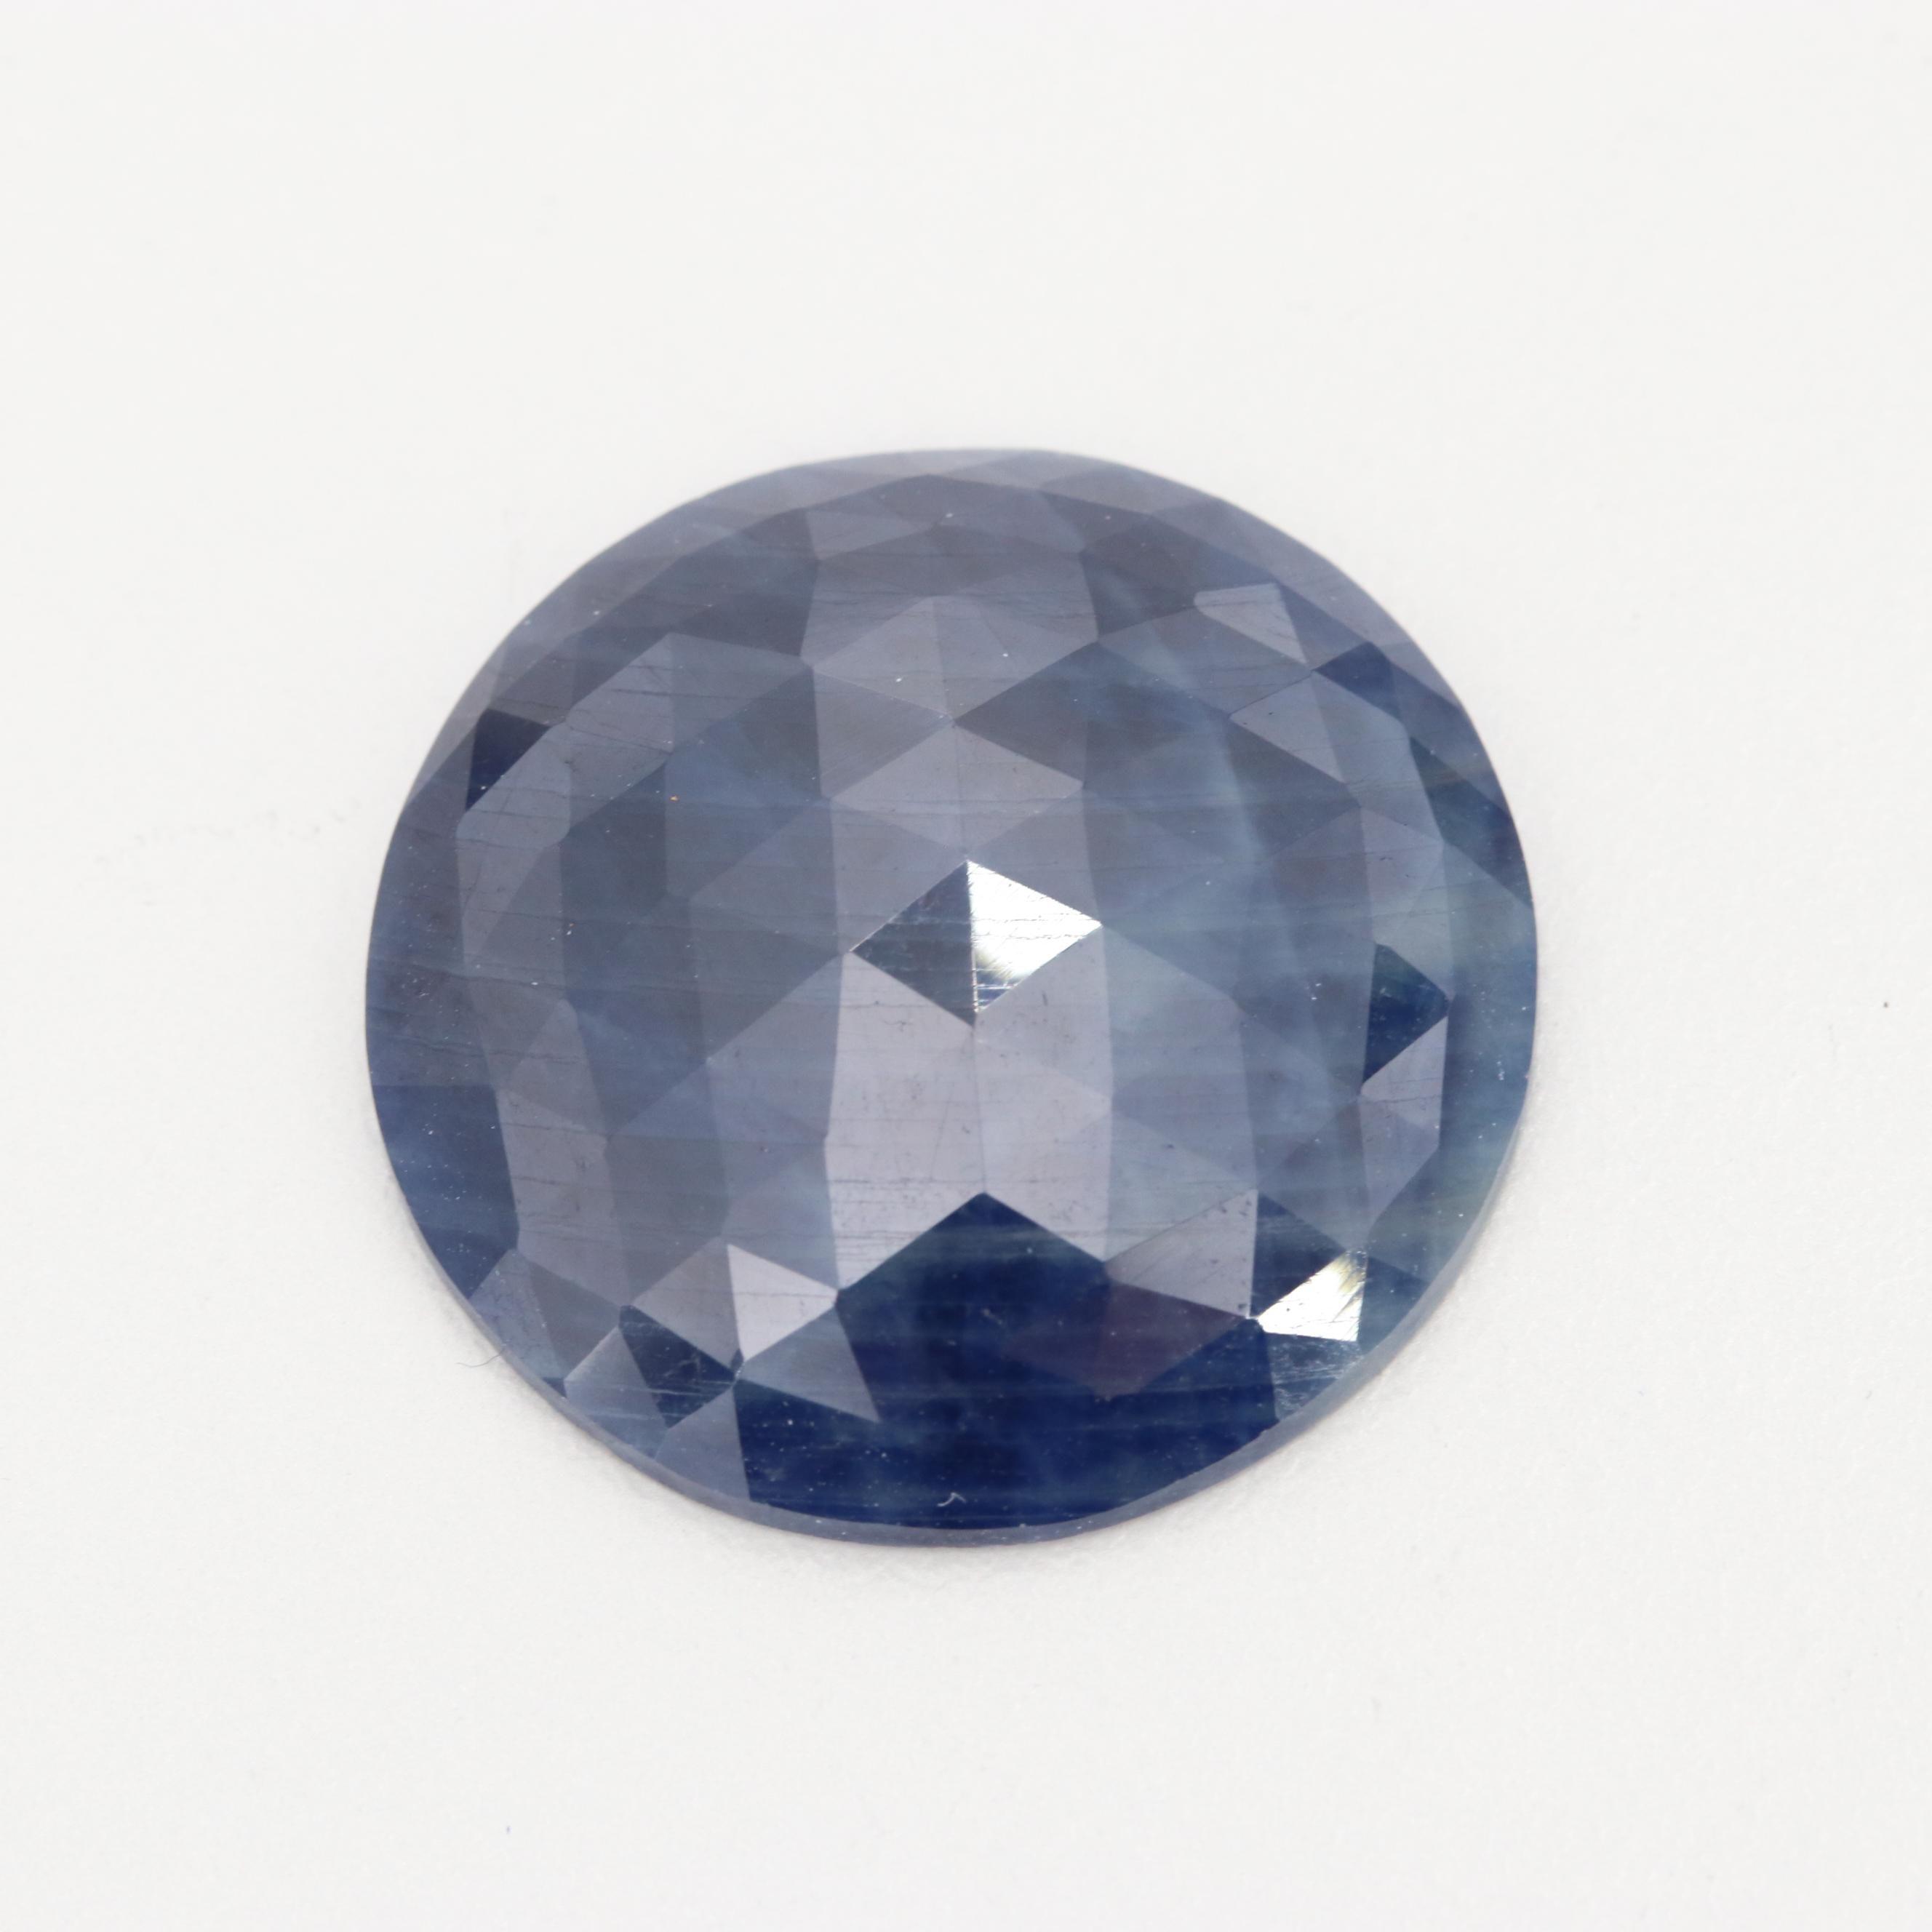 Loose 36.31 CT Sapphire Gemstone